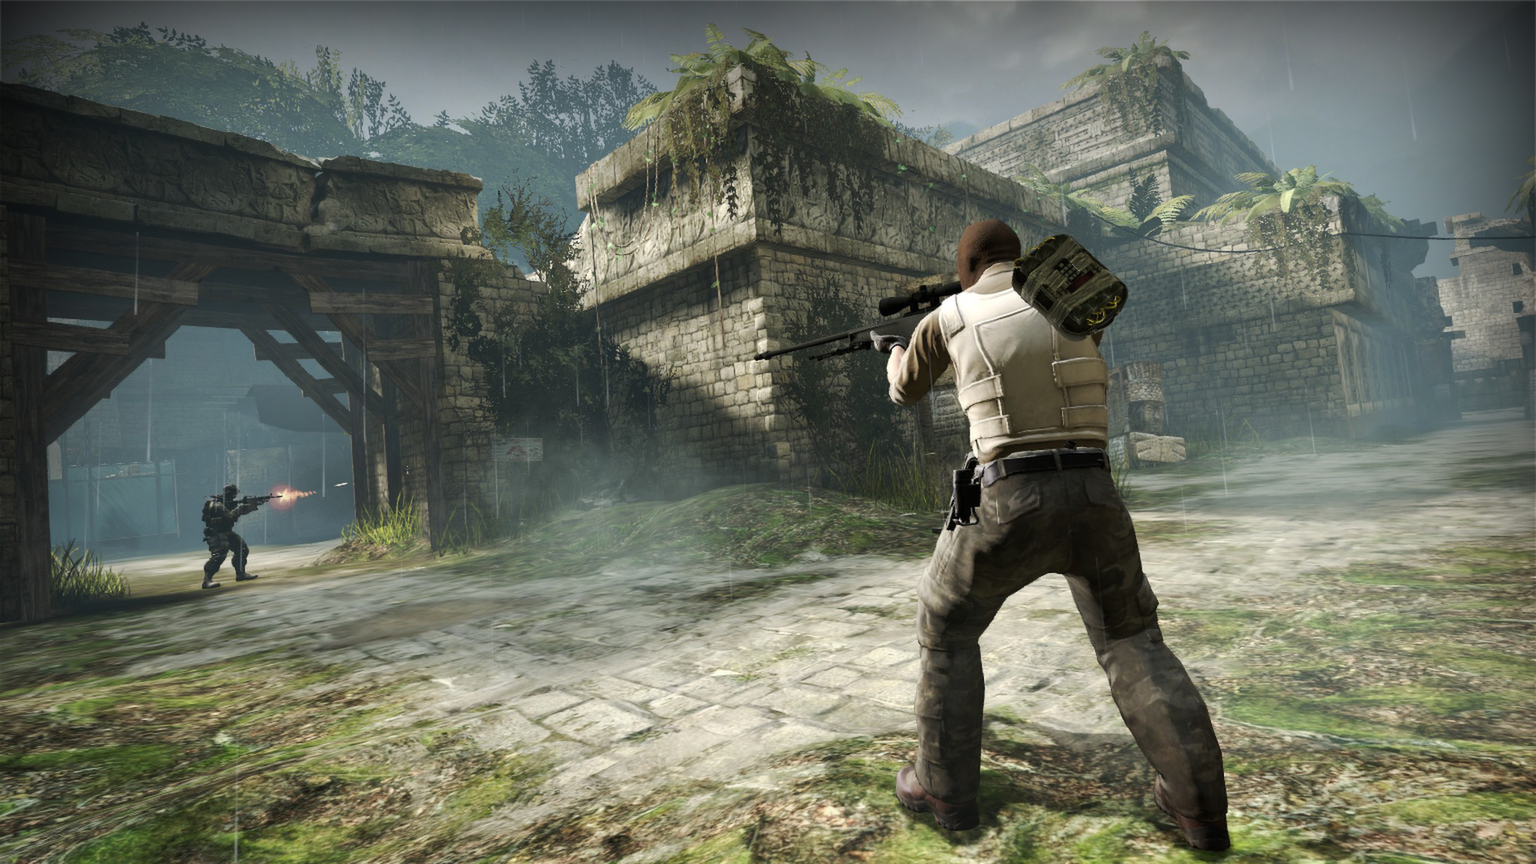 https://www.vgr.com/counter-stirke-global-offensive-20-million-players/